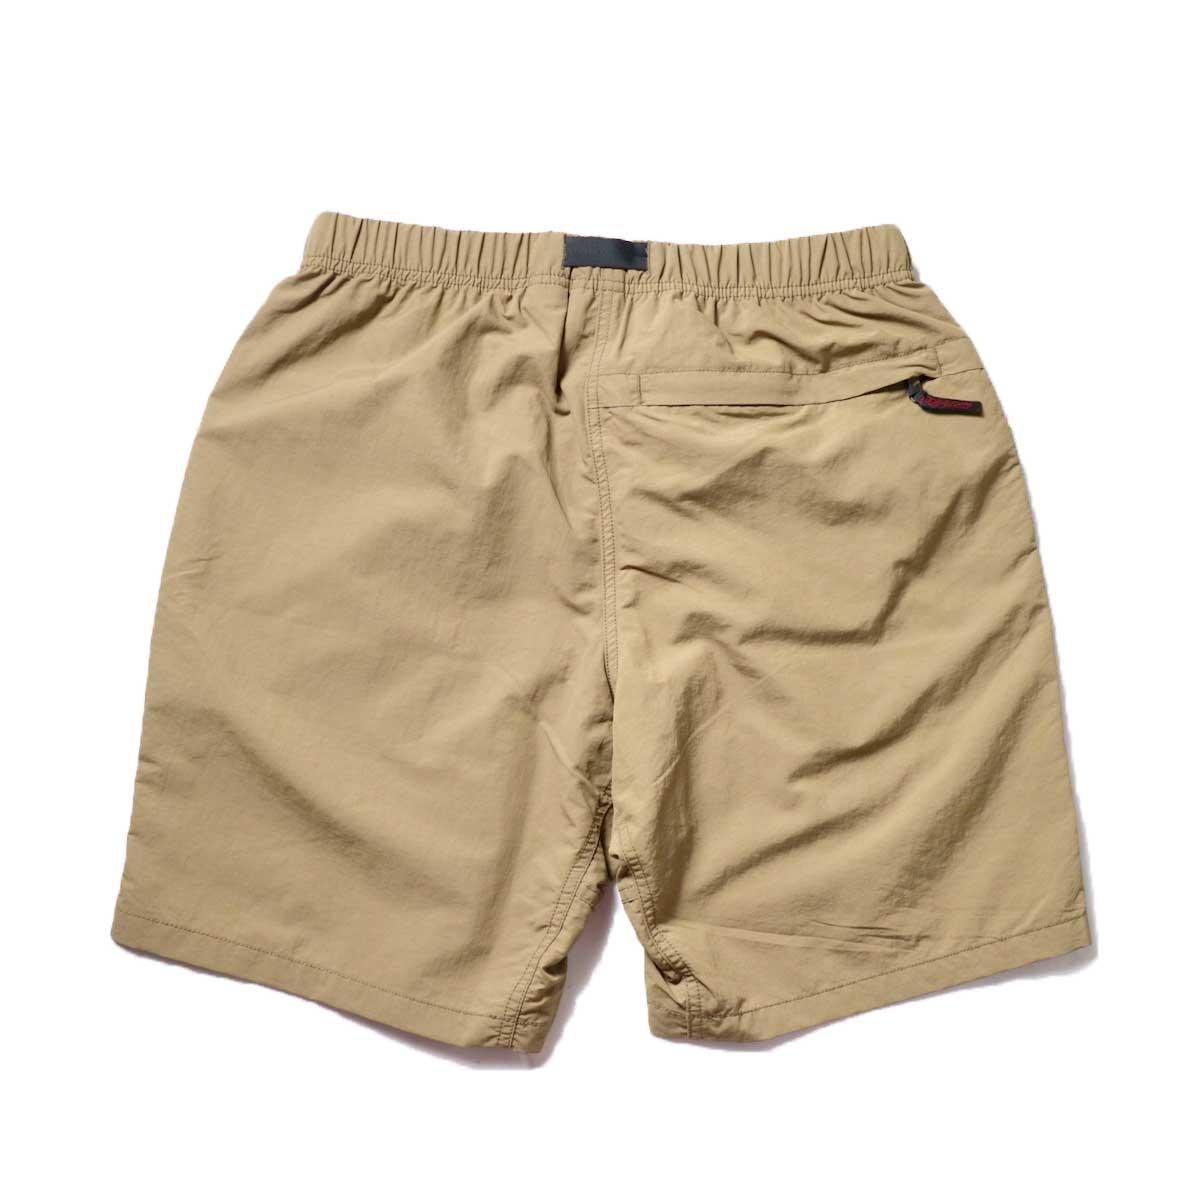 GRAMICCI / SHELL PACKABLE SHORTS (Tan)背面